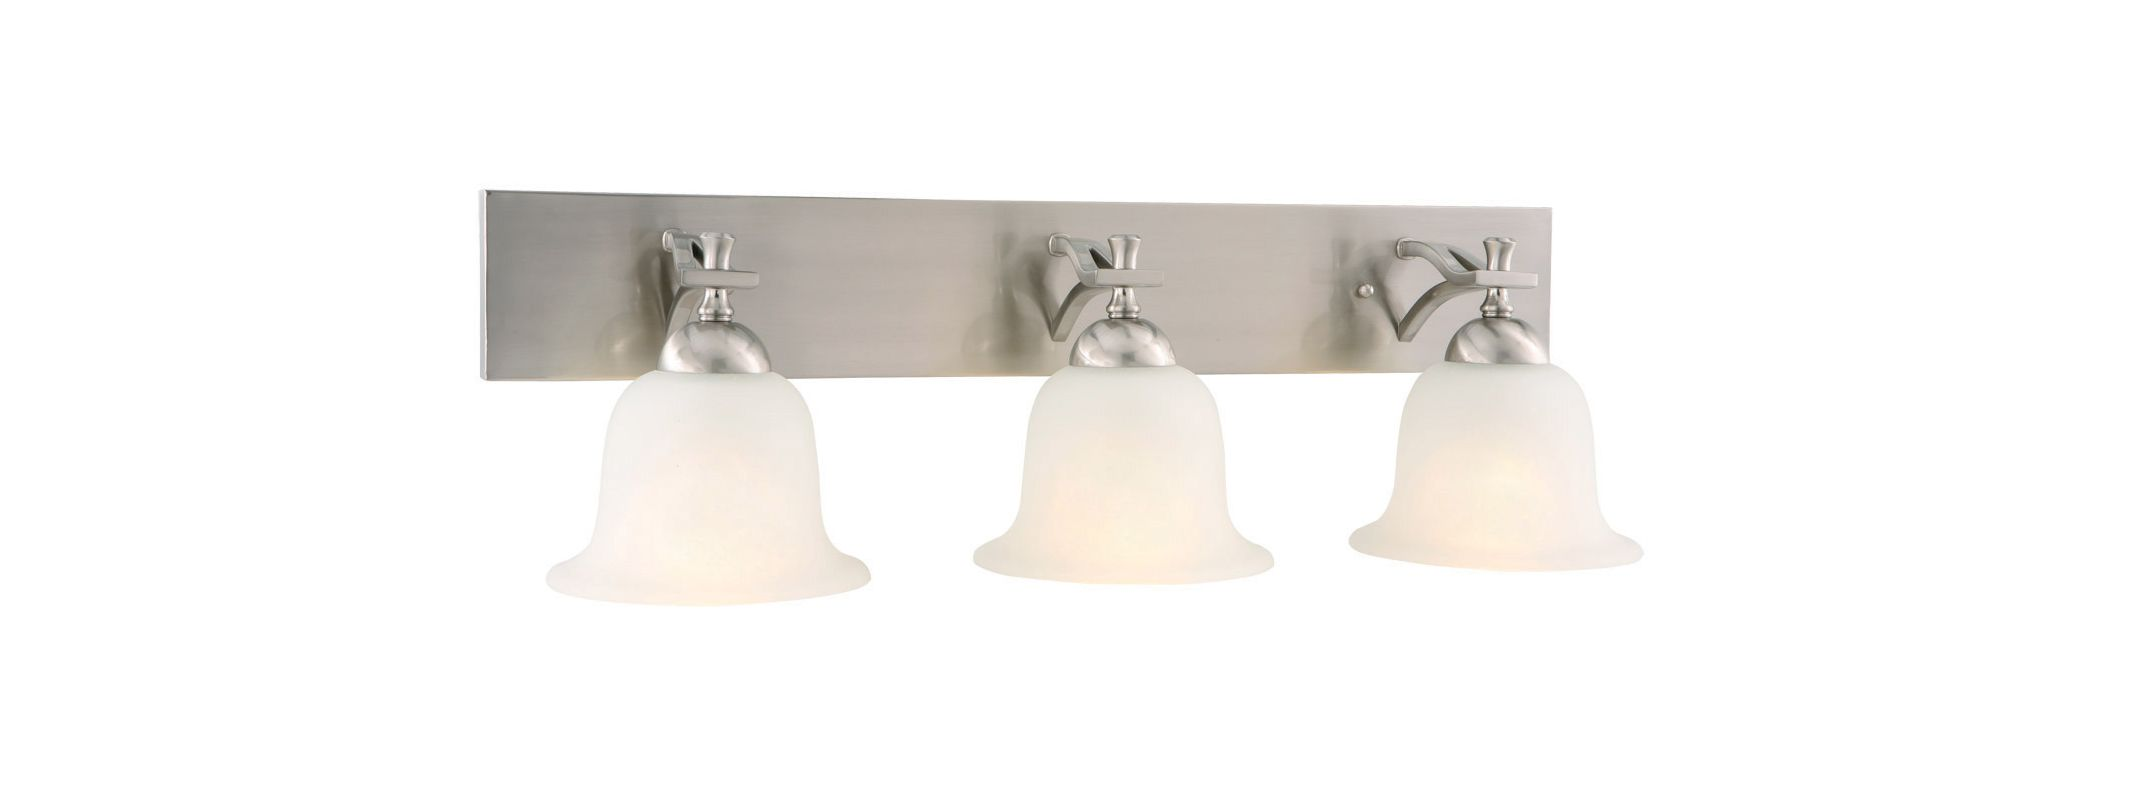 Design House 515692 Ironwood 3 Light Down Lighting Energy Star Sale $160.93 ITEM: bci1286935 ID#:515692 UPC: 44321515690 :